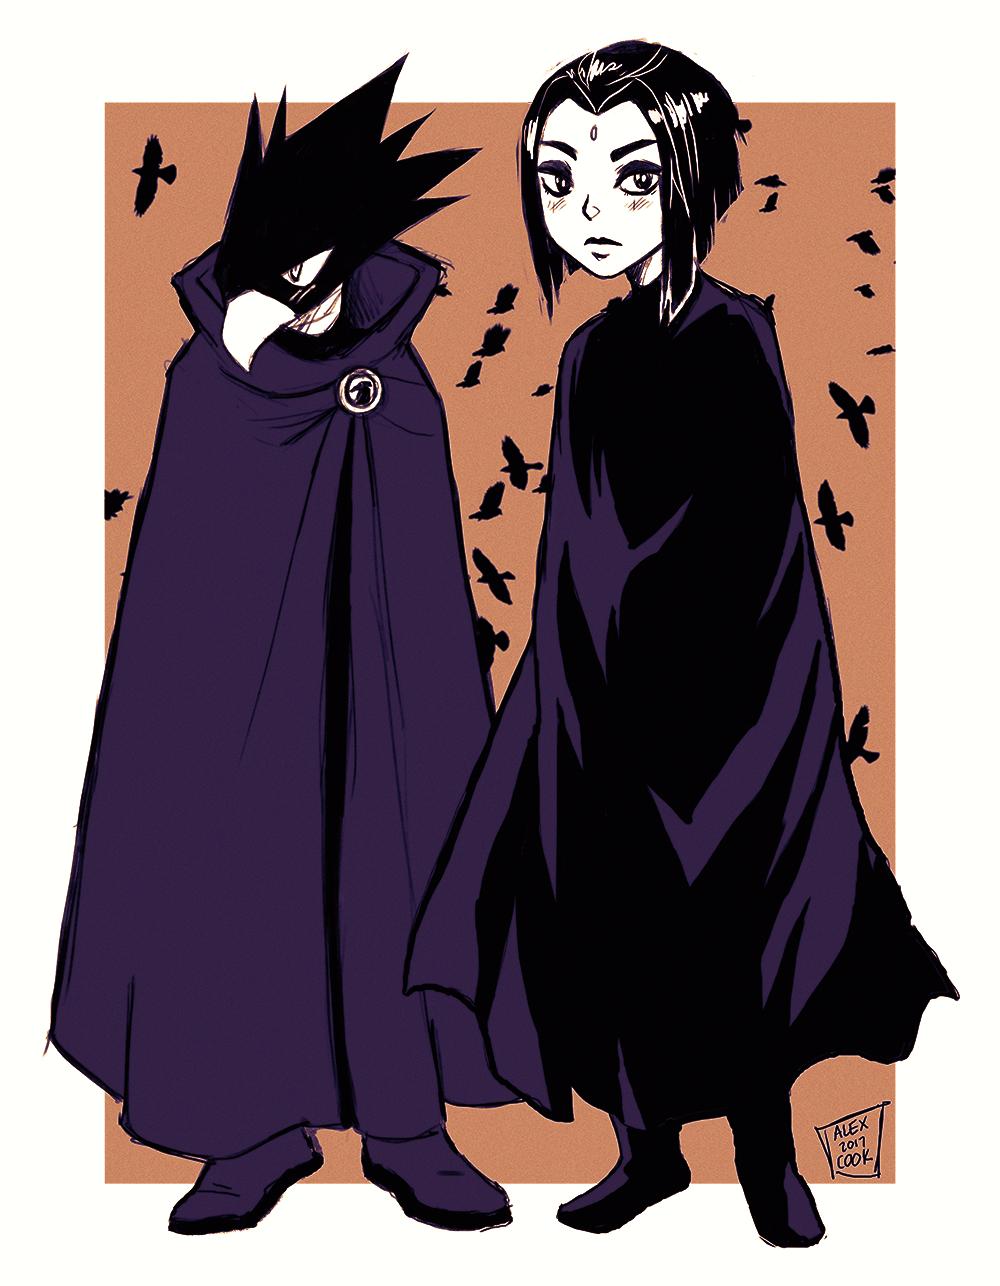 ⚡ ⚡ ⚡ ⚡ ⚡ ⚡ ⚡ ⚡ — outfit swap for you tokoyami x raven